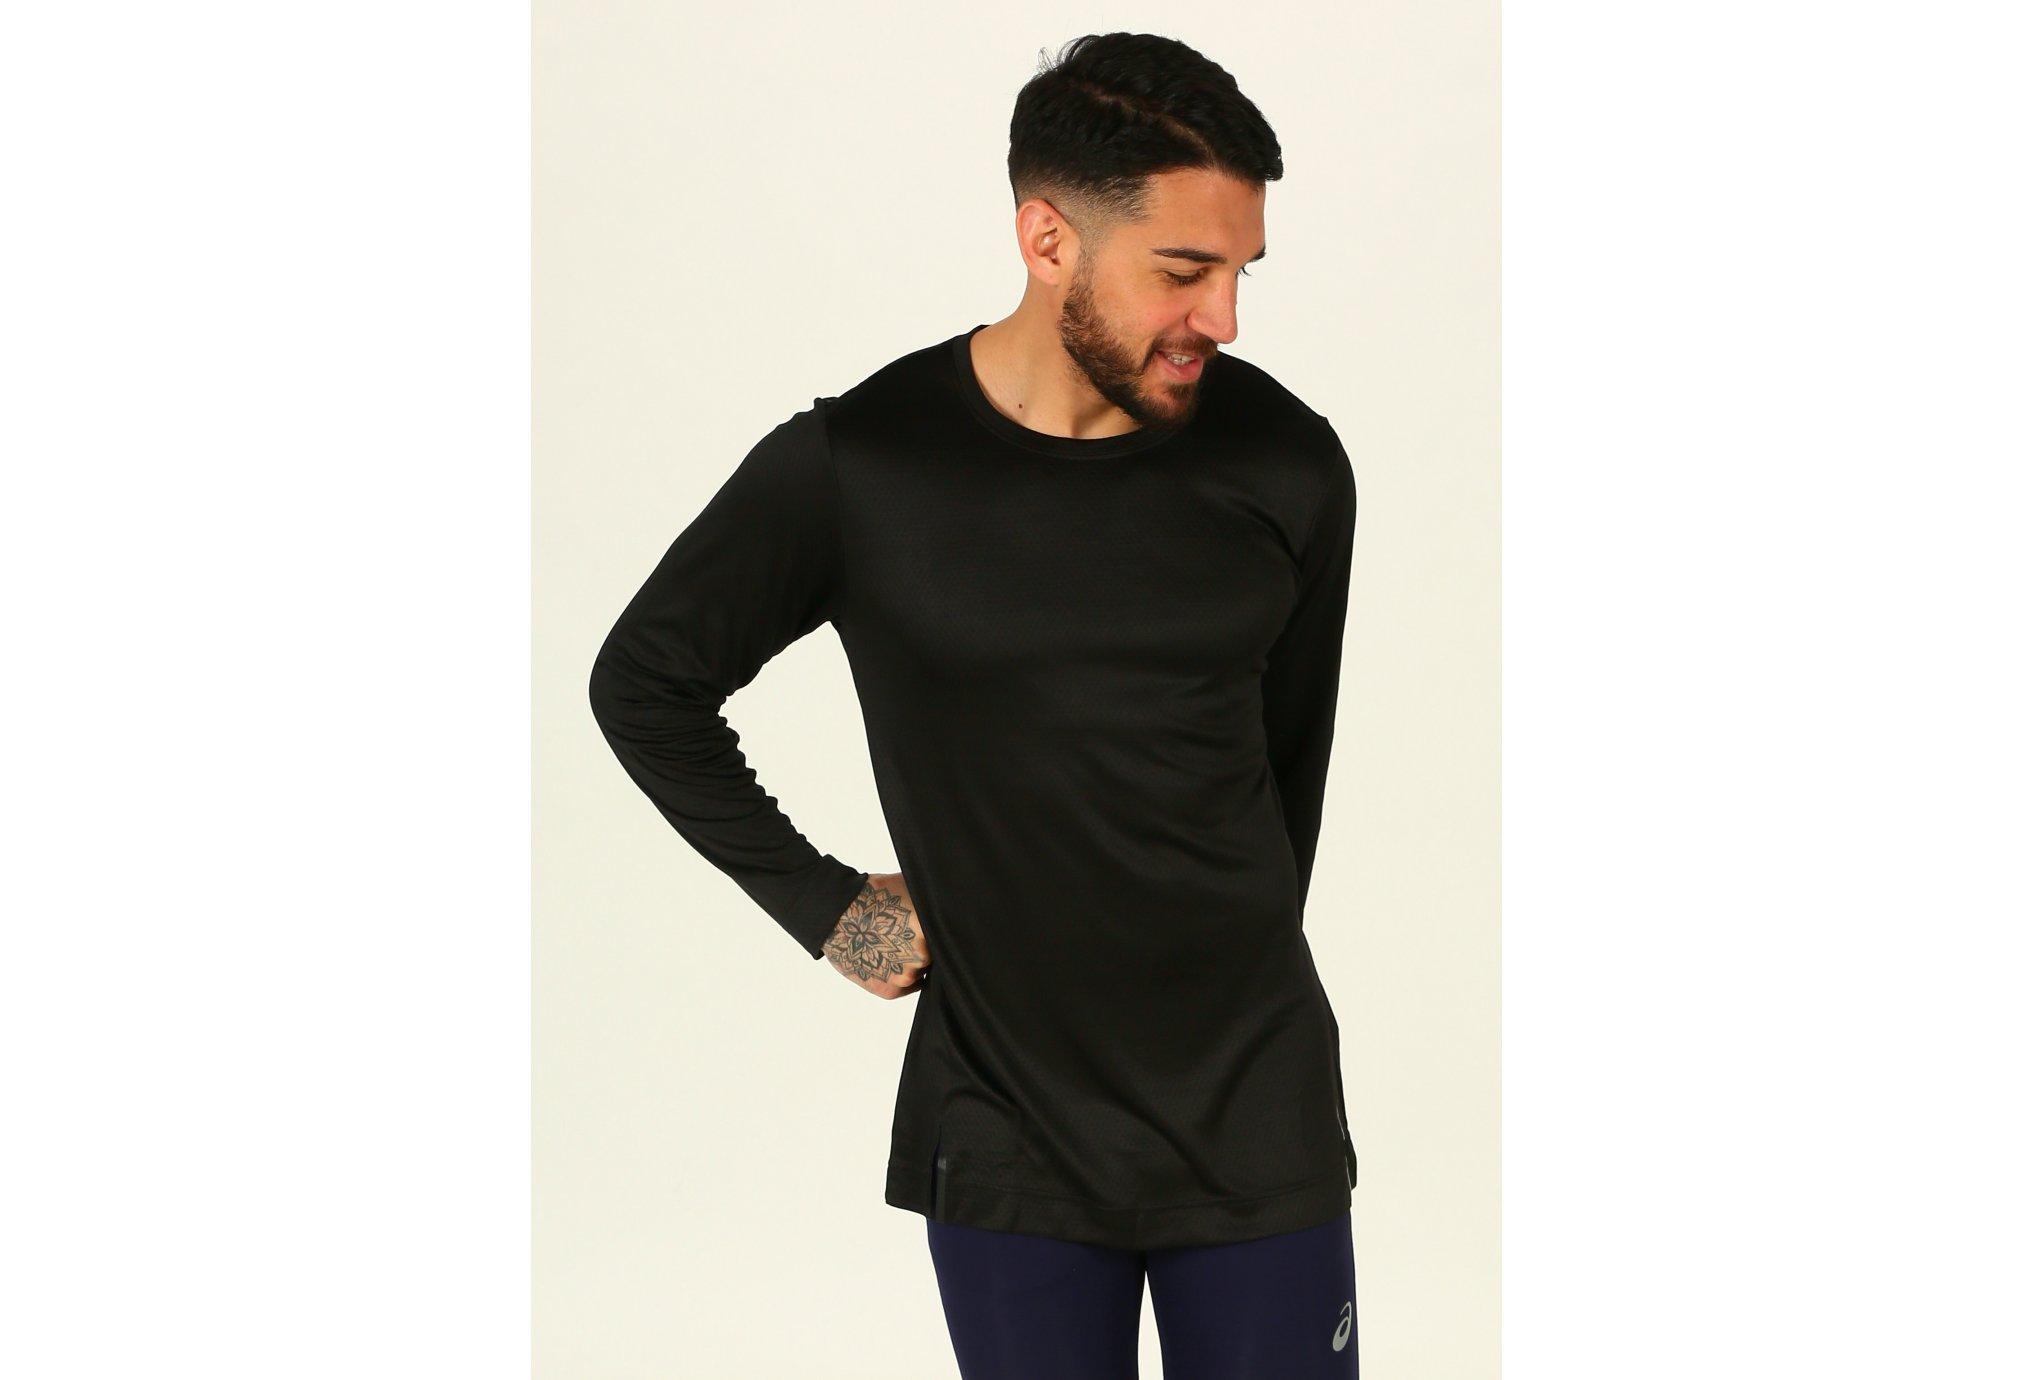 Asics Long-Sleeved Top M vêtement running homme